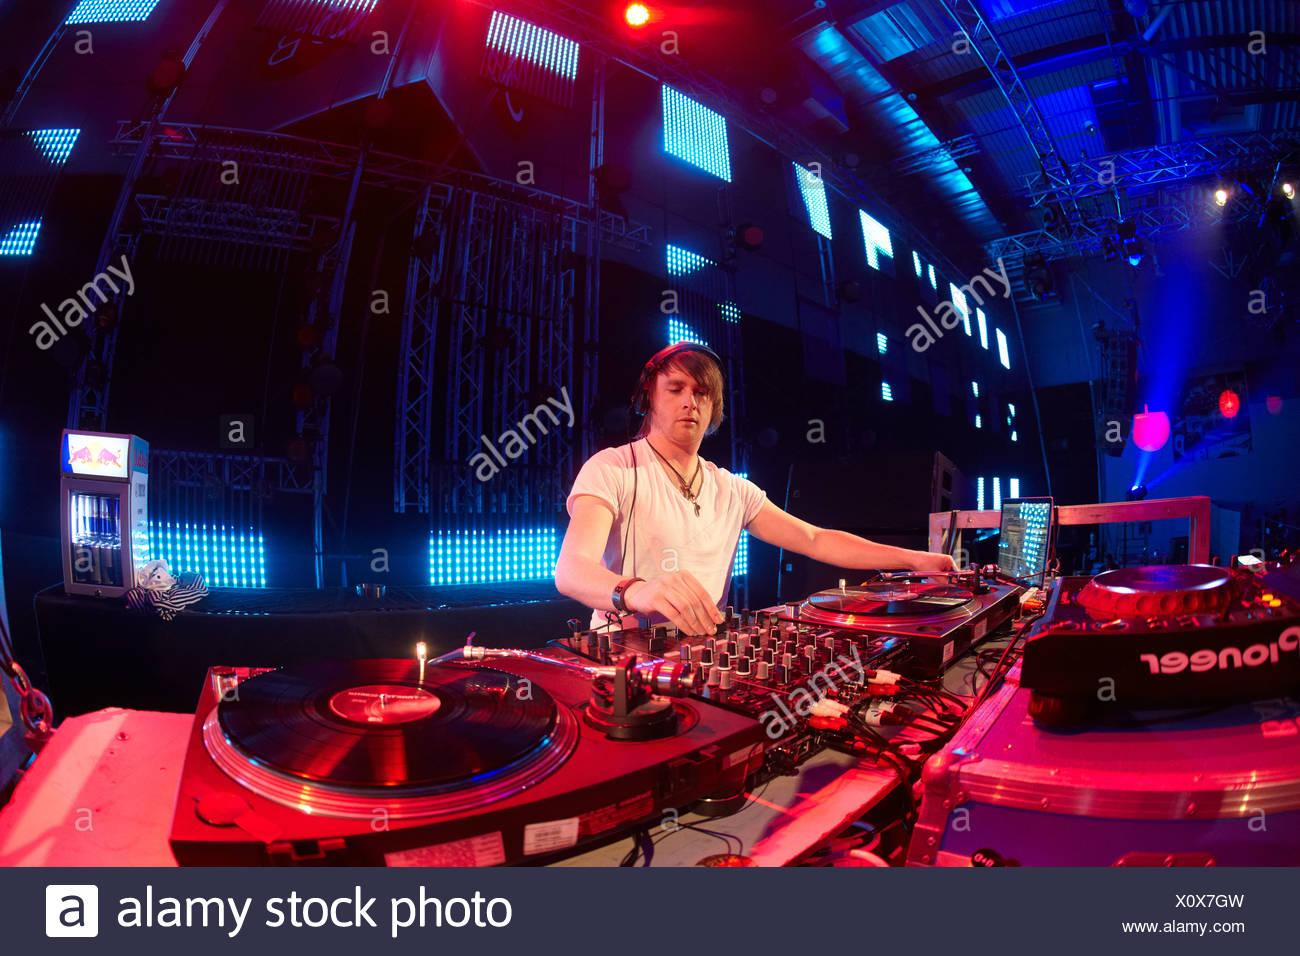 Mayday 2011 techno festival, Westfalenhalle, DJ Gary Beck, Dortmund, North Rhine-Westphalia, Germany, Europe - Stock Image